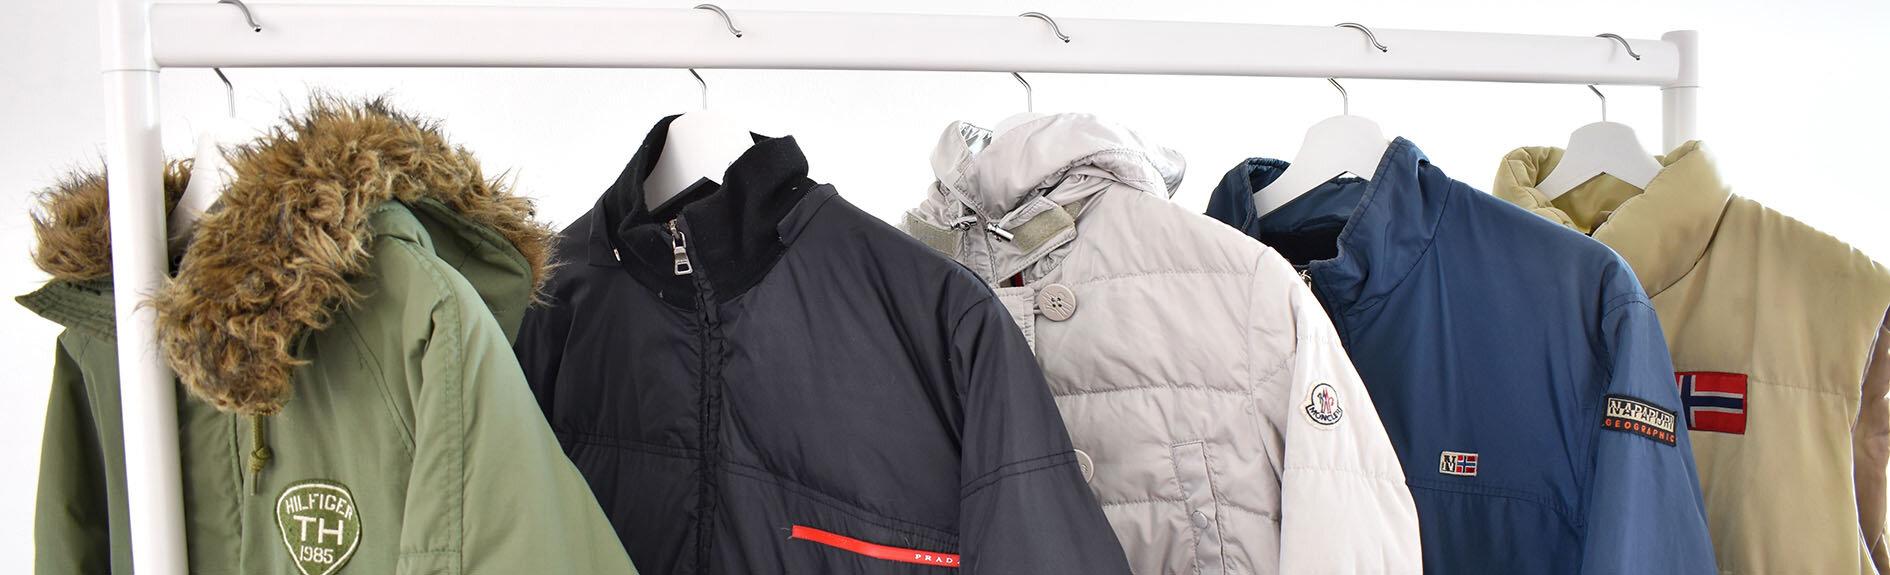 Shop Jackets and coats -